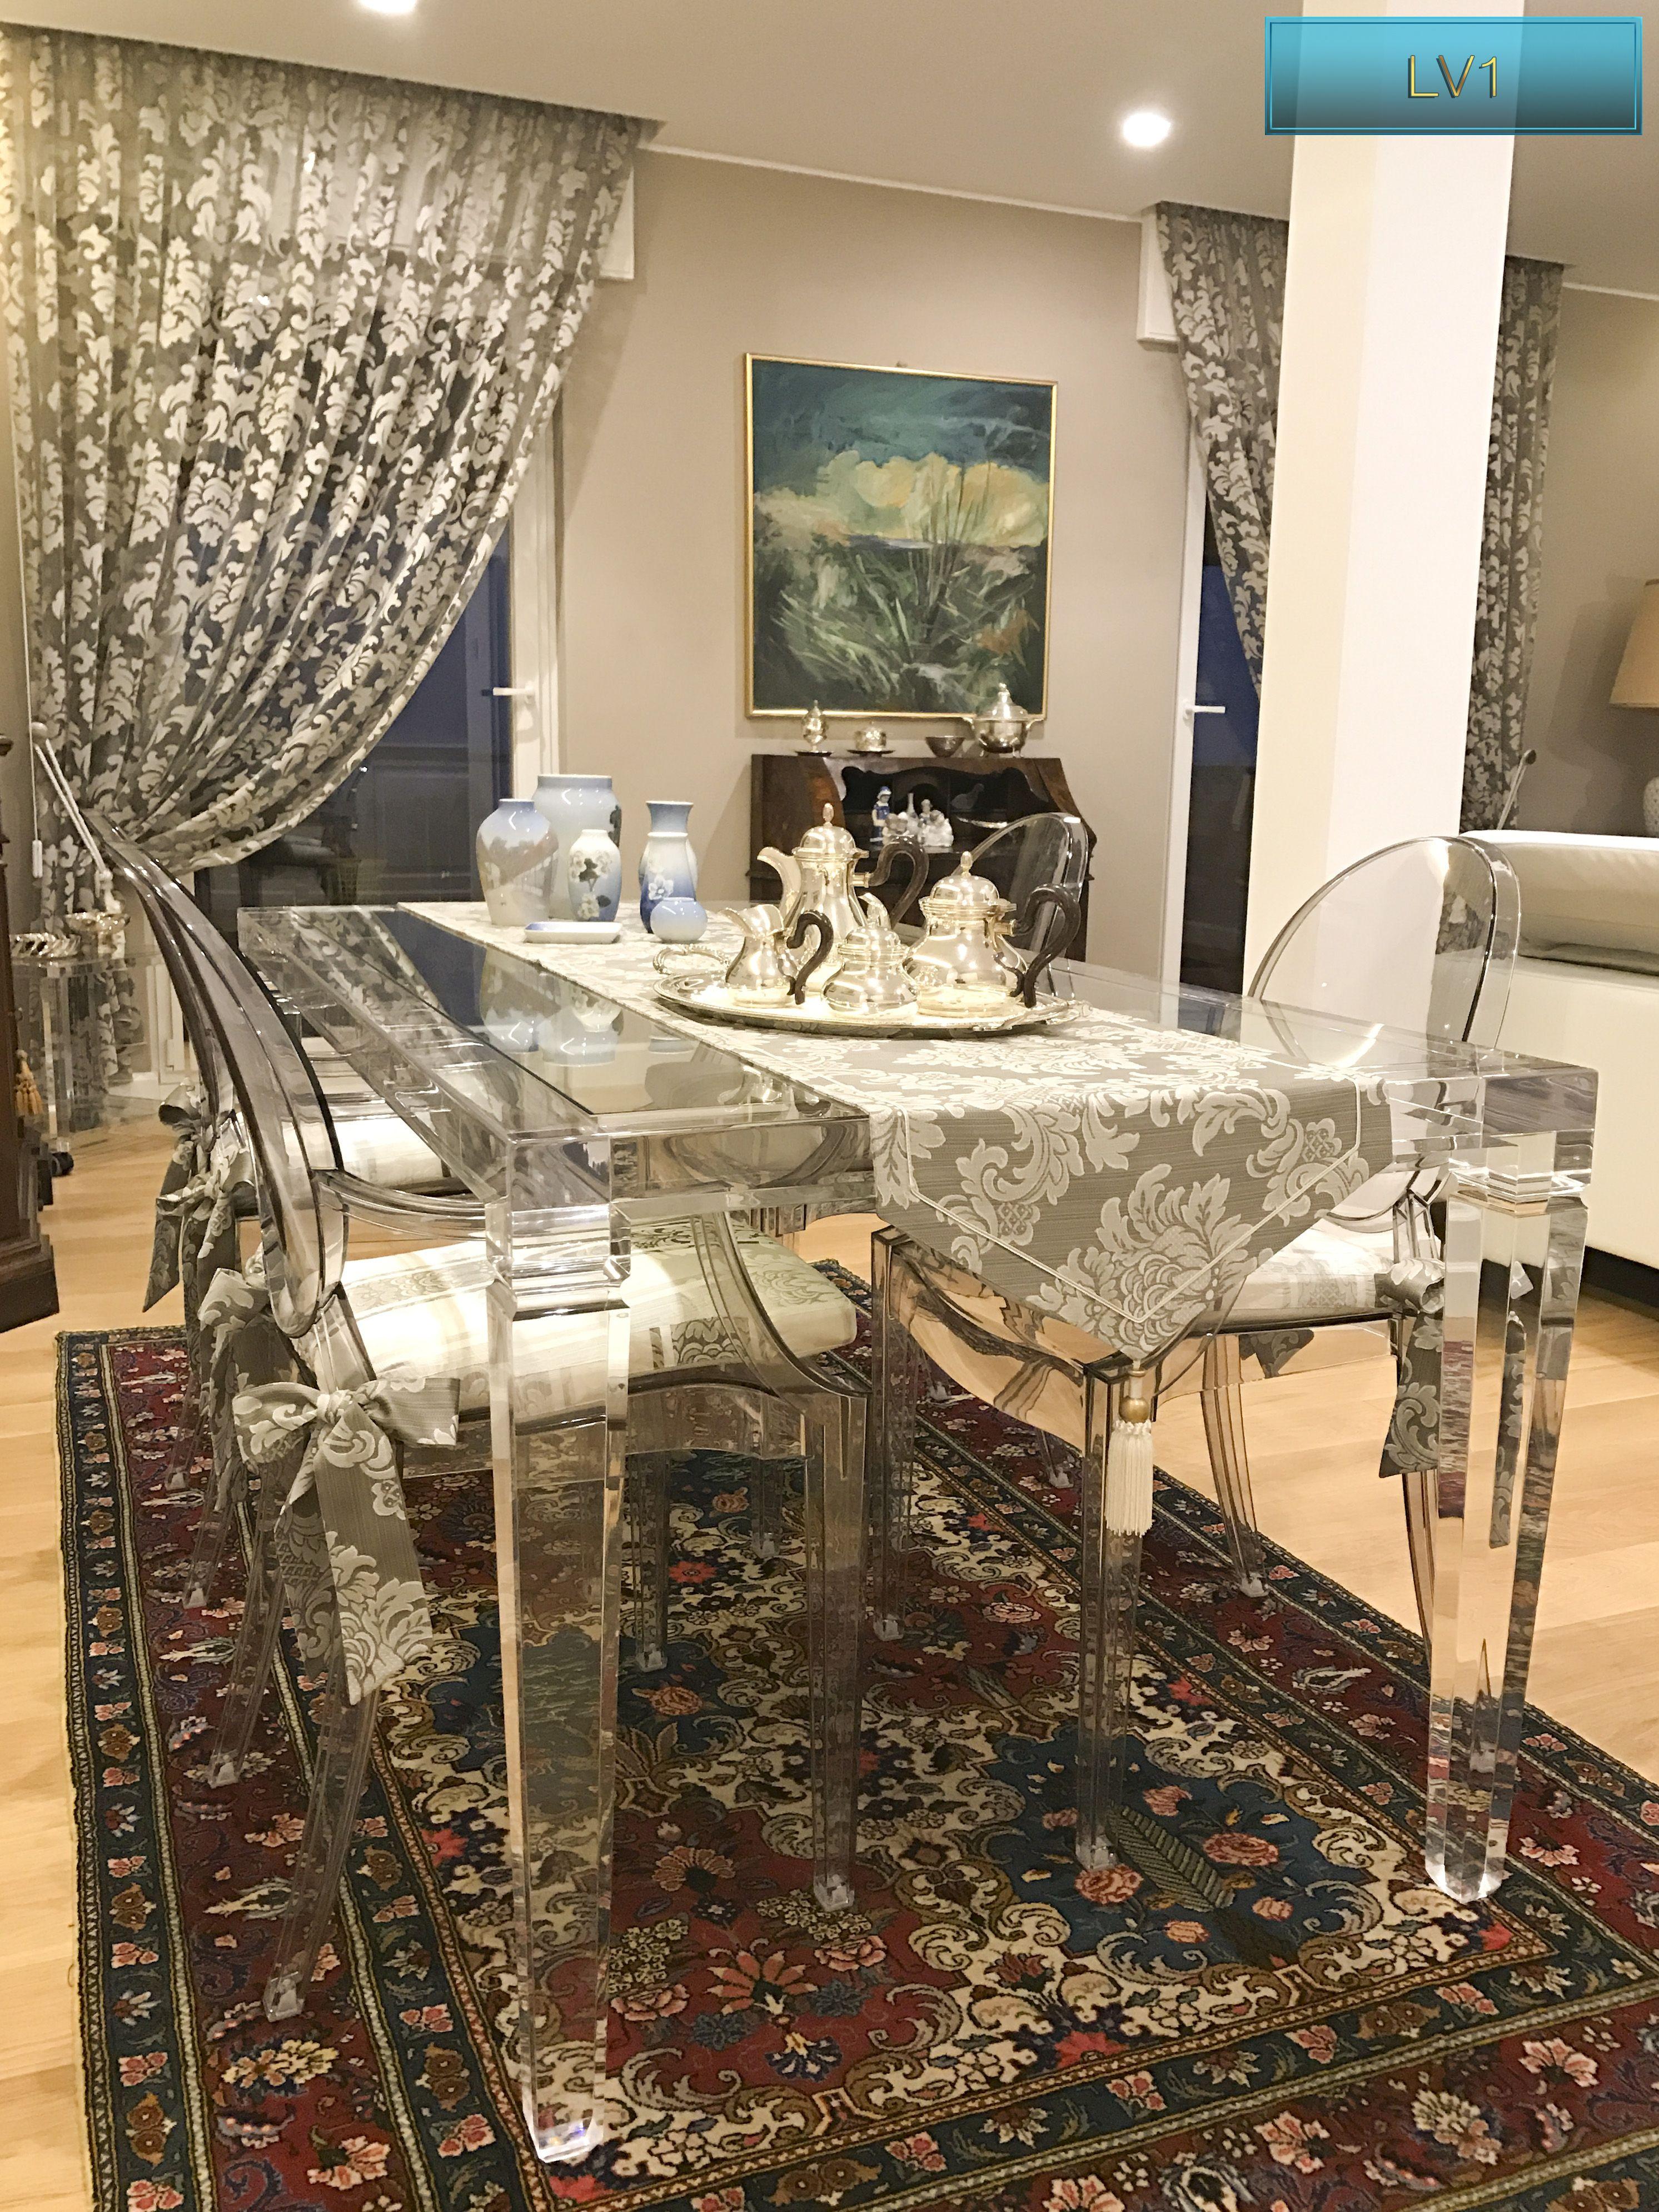 Lucite Acrylic dining table - TAVOLI PRANZO IN PLEXIGLAS | Tavolo ...